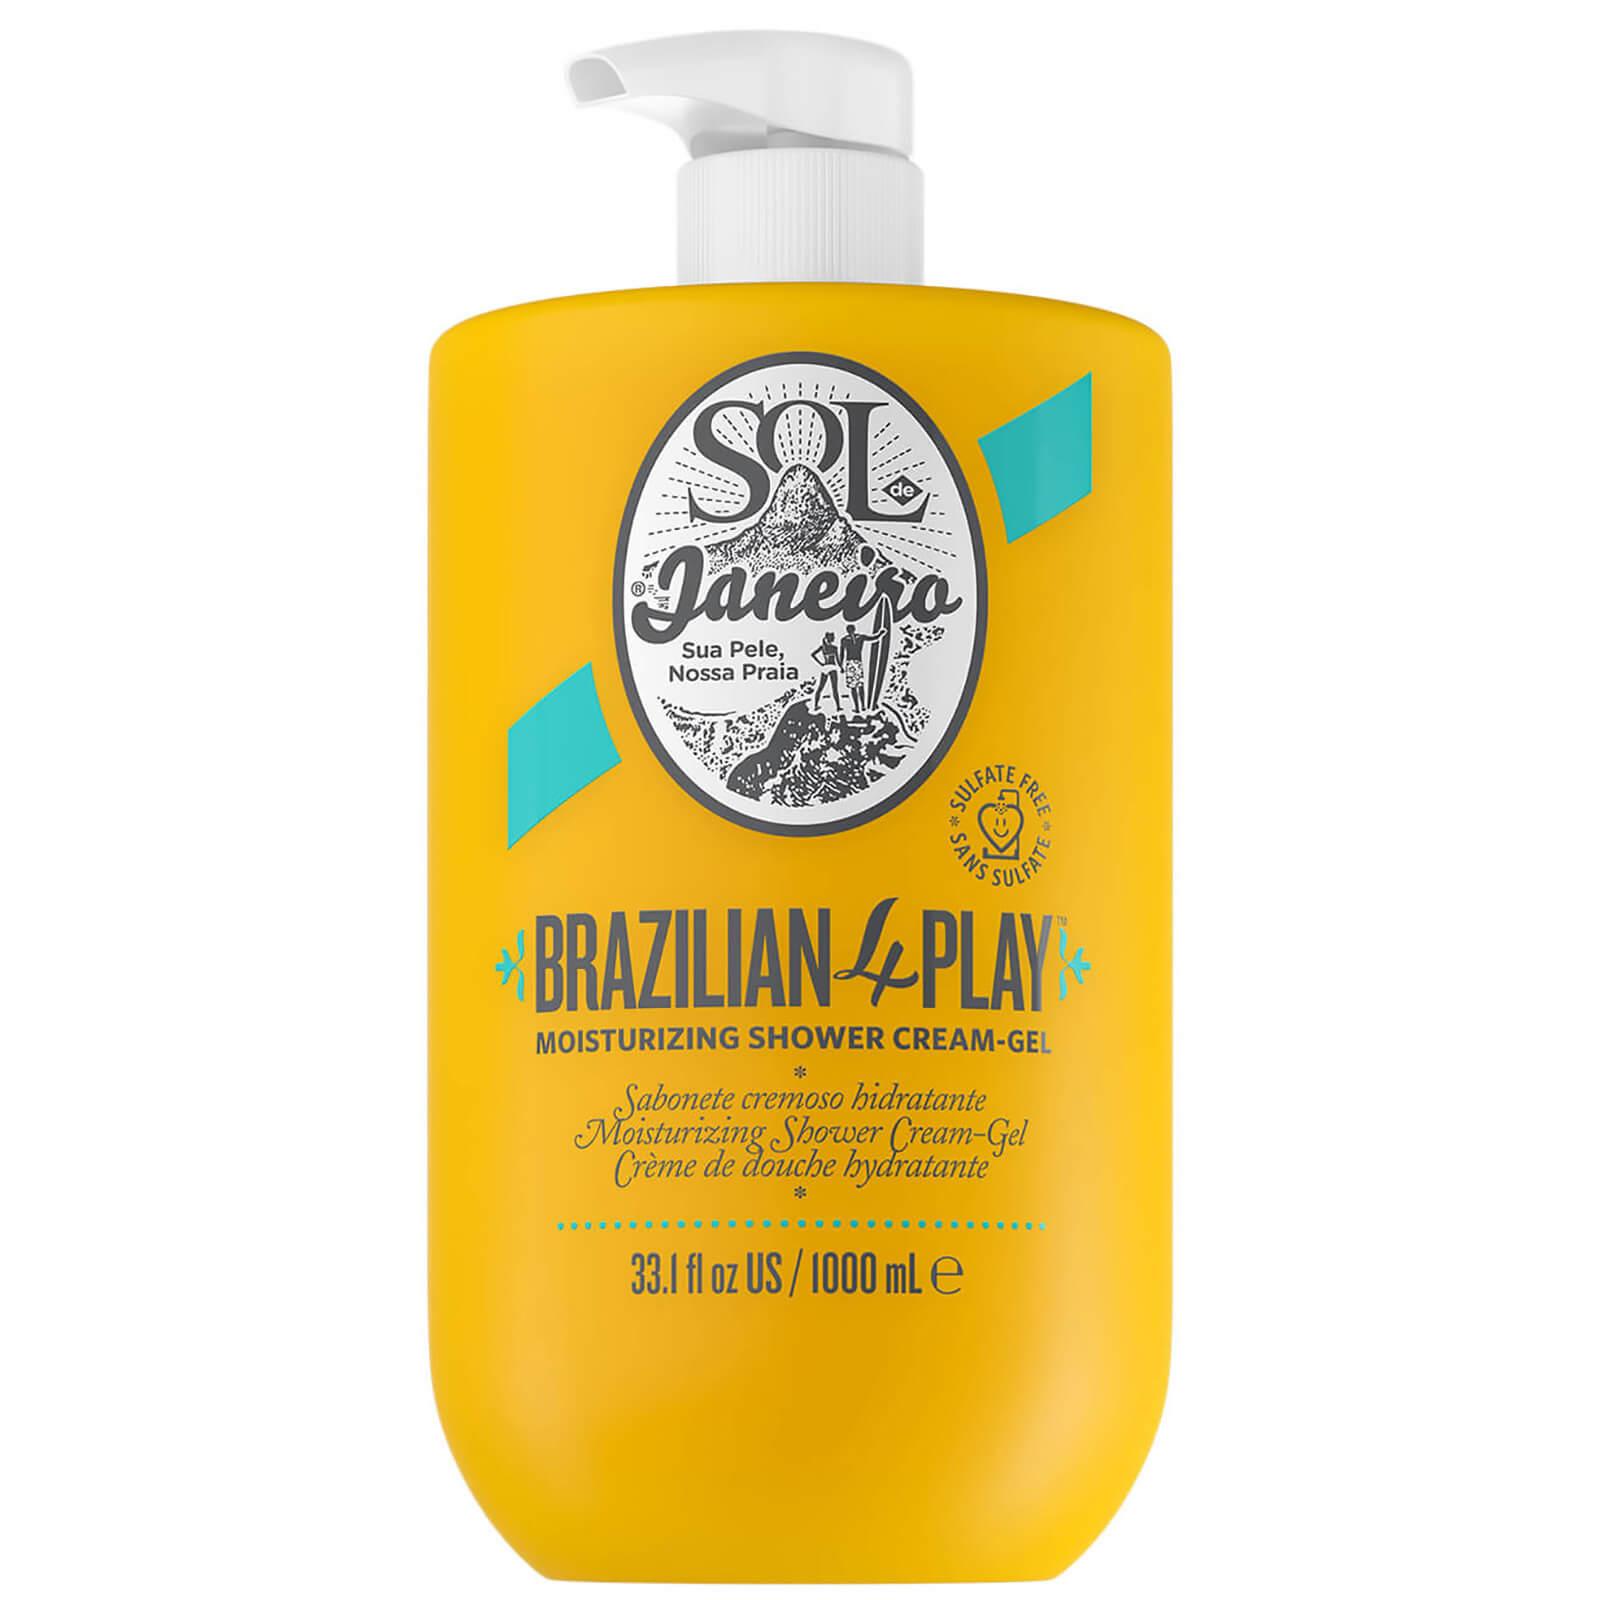 Купить Sol de Janeiro Brazilian 4Play Moisturizing Shower Cream-Gel 1000ml